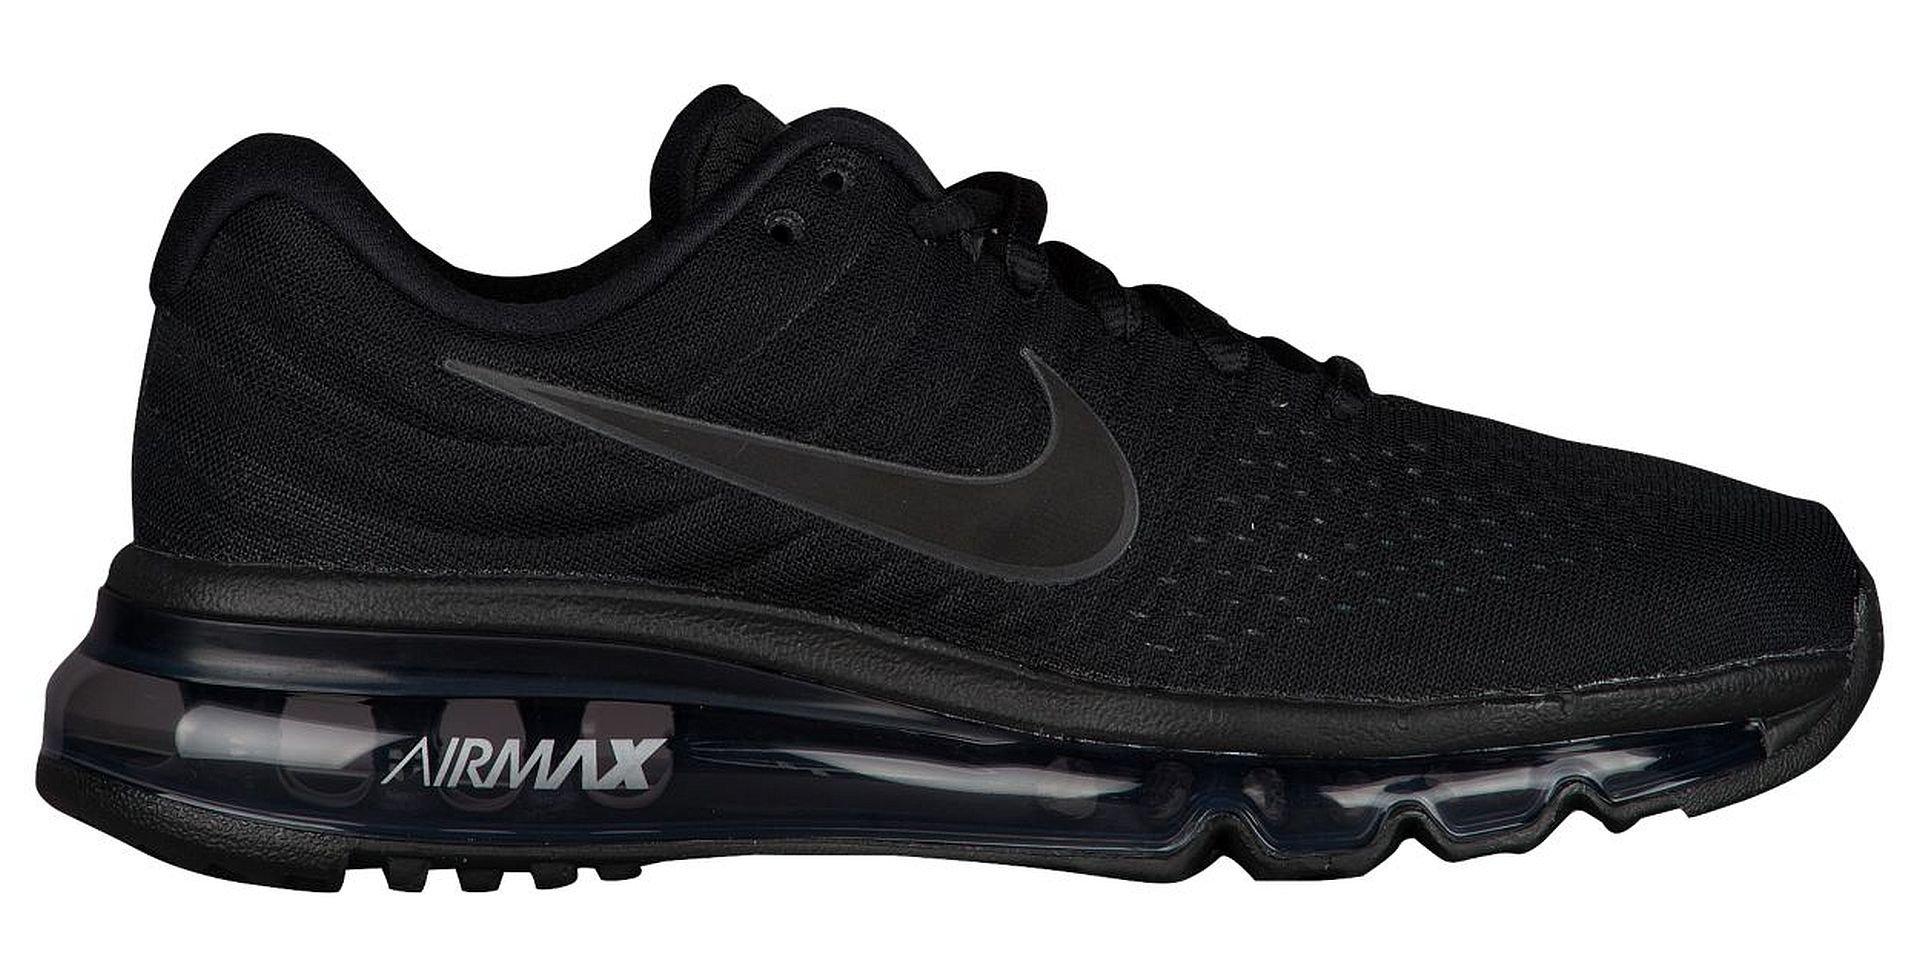 Nike Big Kids Air Max 2017 (GS) Running Shoe Black/Black-Black (4Y) by NIKE